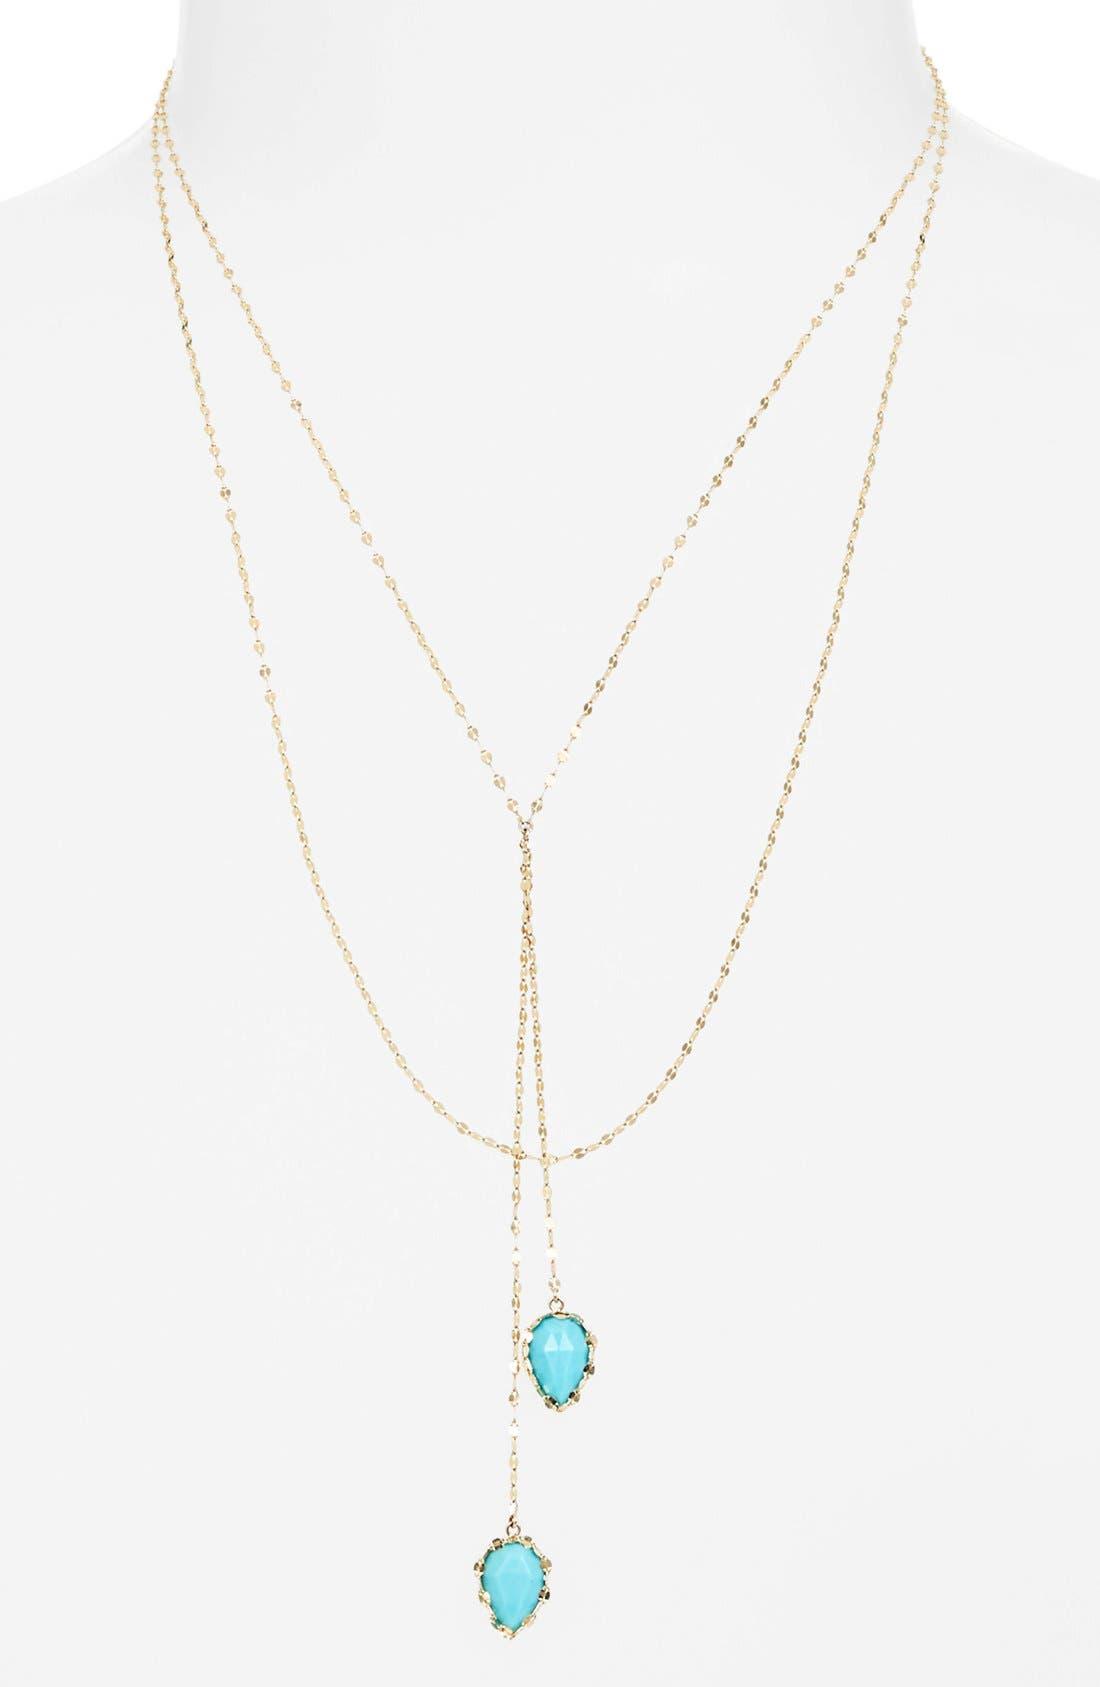 Alternate Image 1 Selected - Lana Jewelry 'Blush' Lariat Necklace